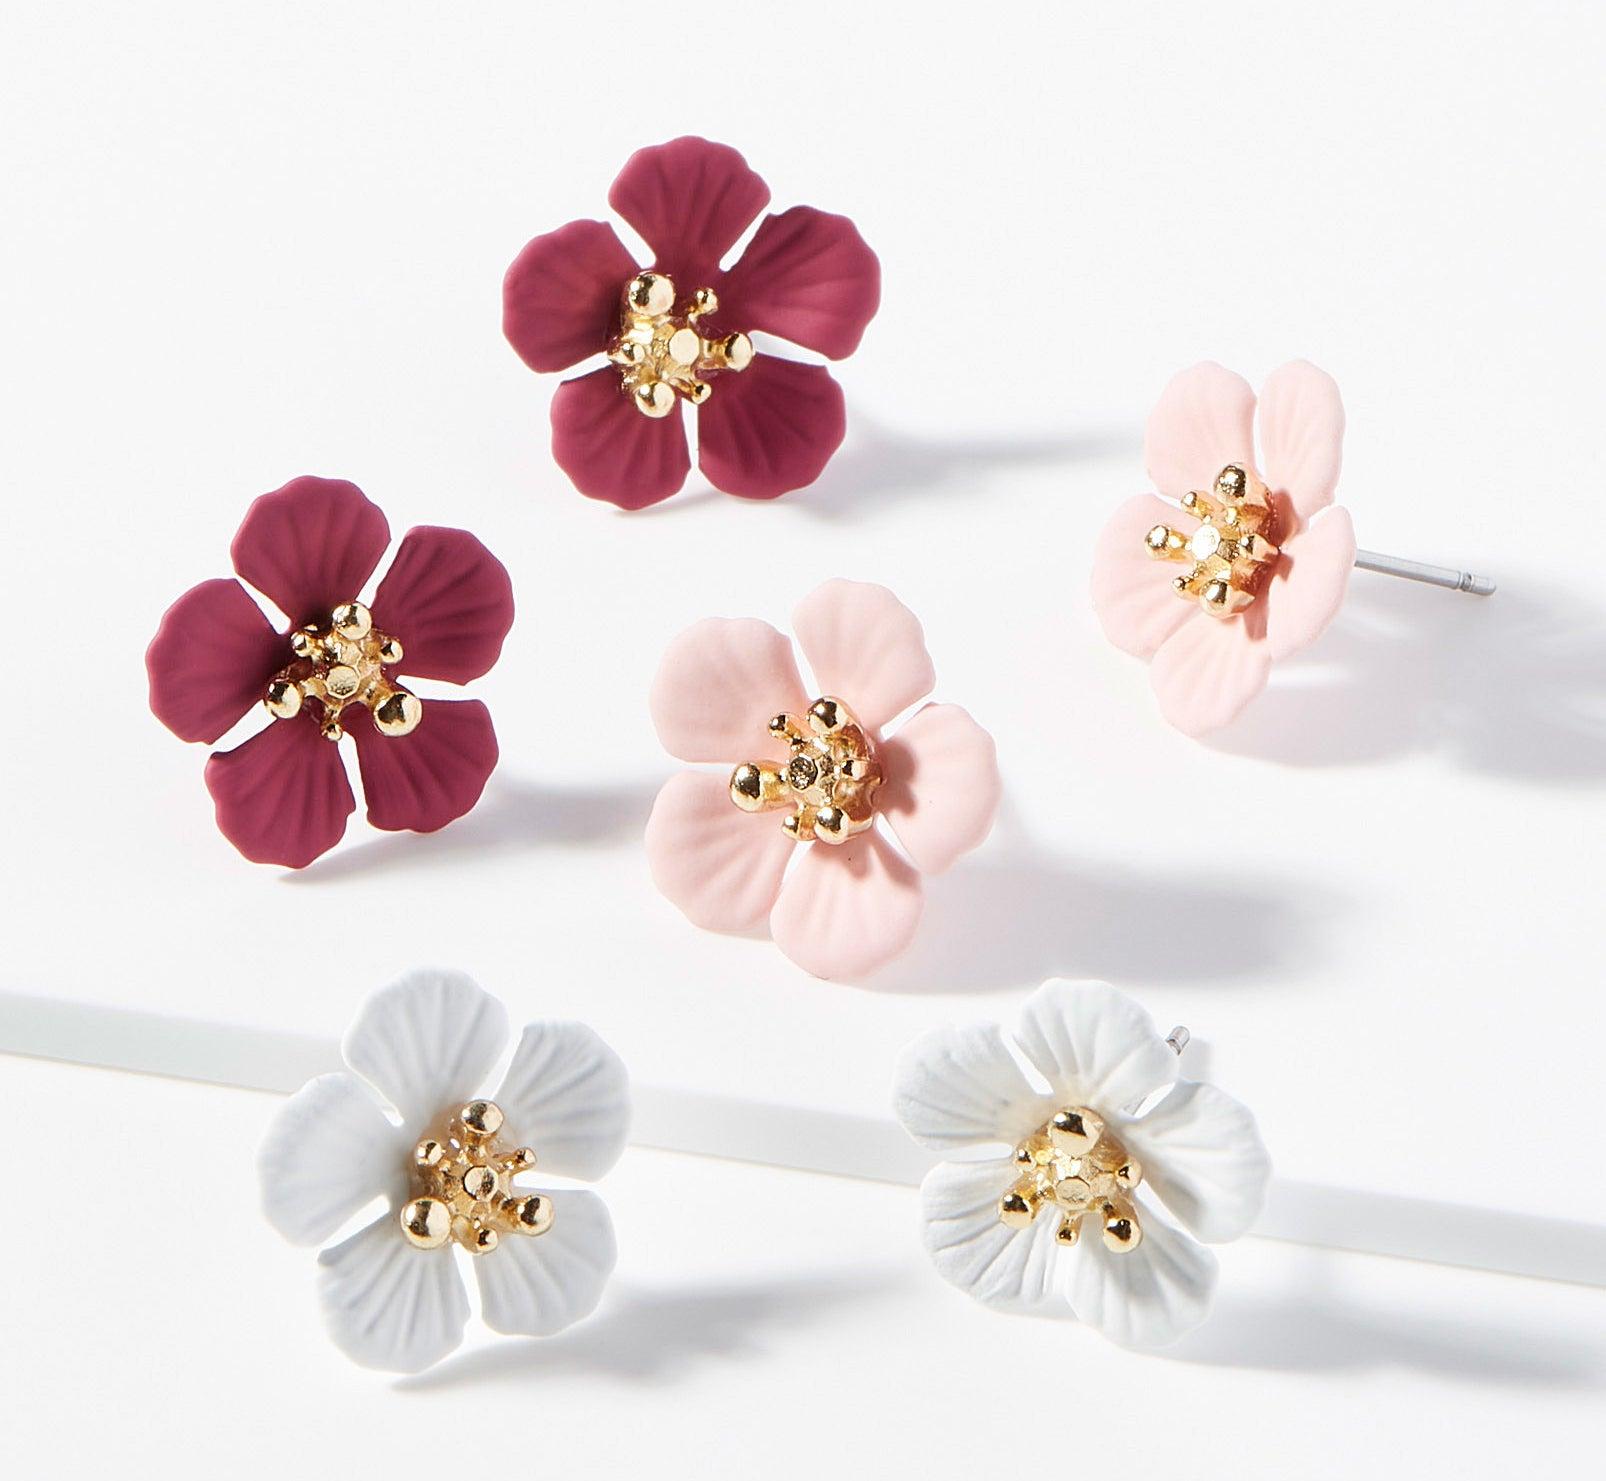 Three pairs of flower-shaped earrings